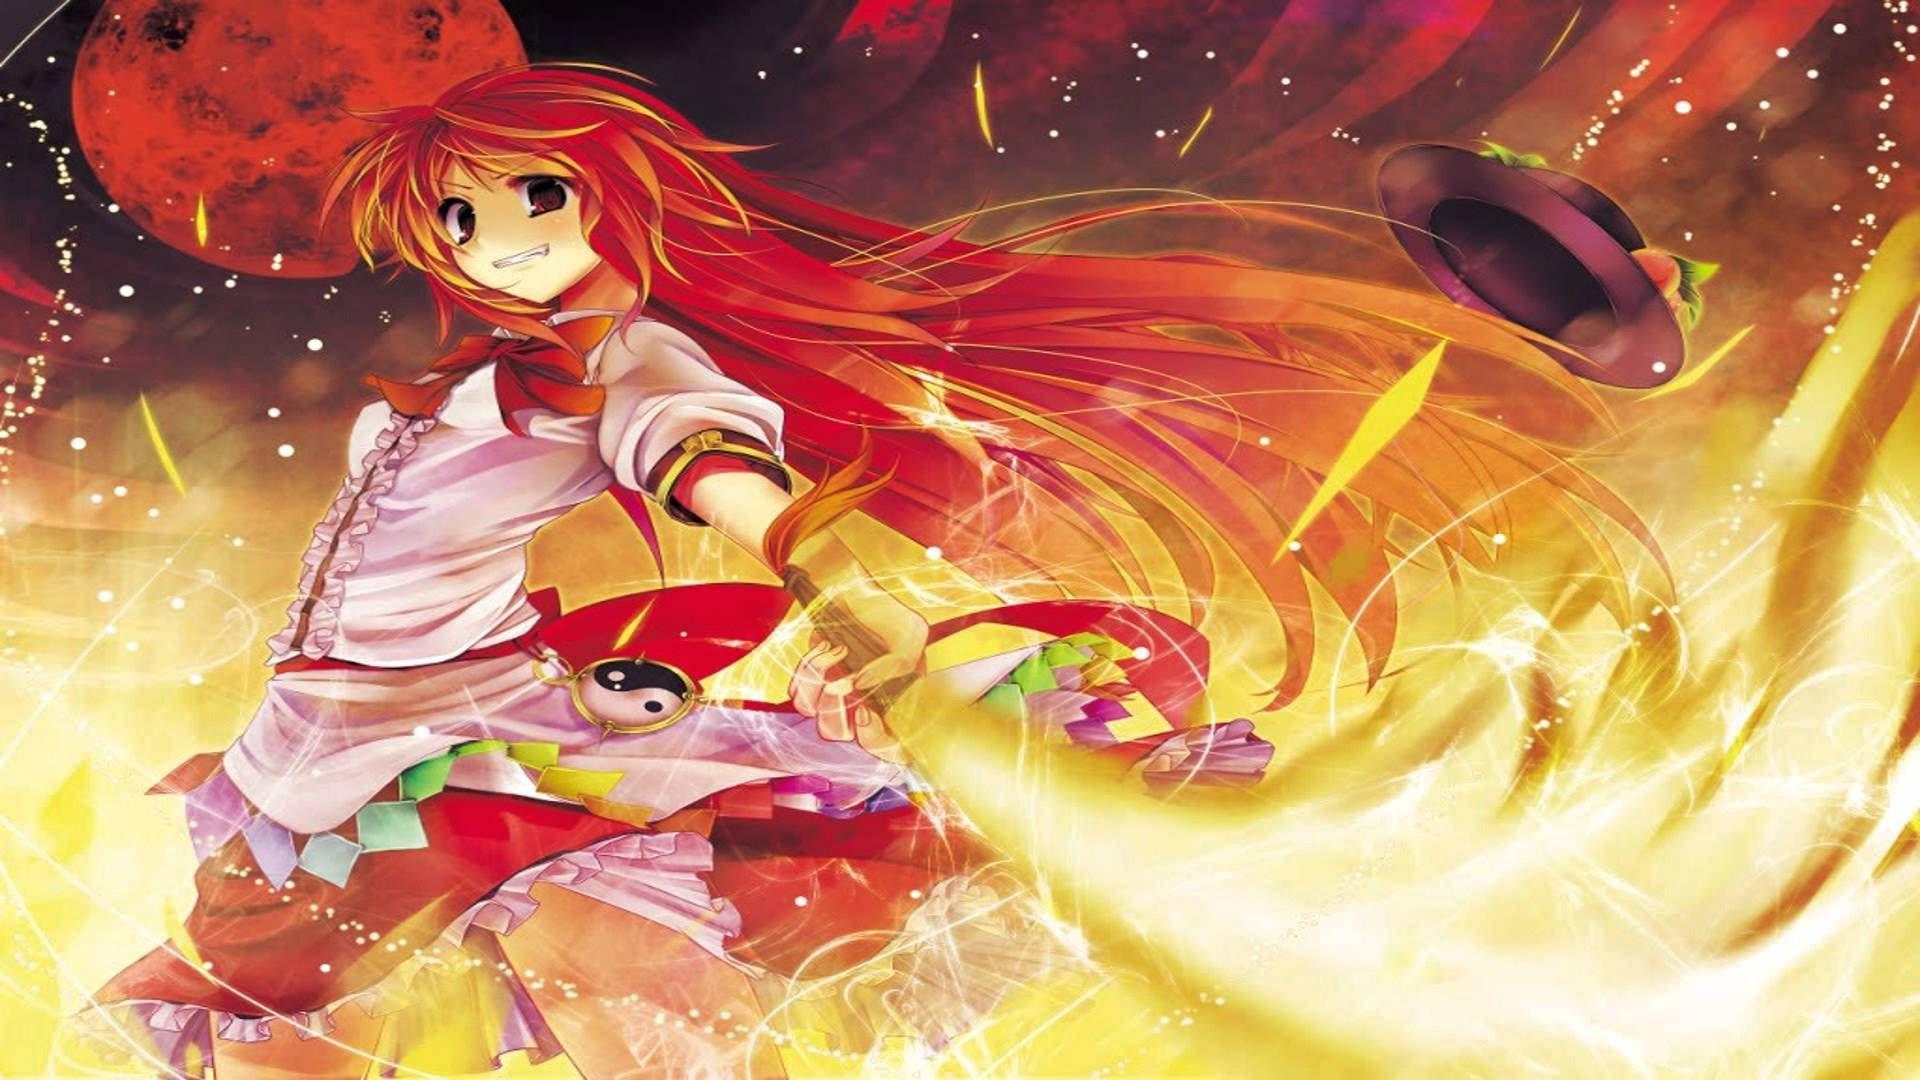 Nightcore - Fire Burning | Nightcore | Anime music, Anime